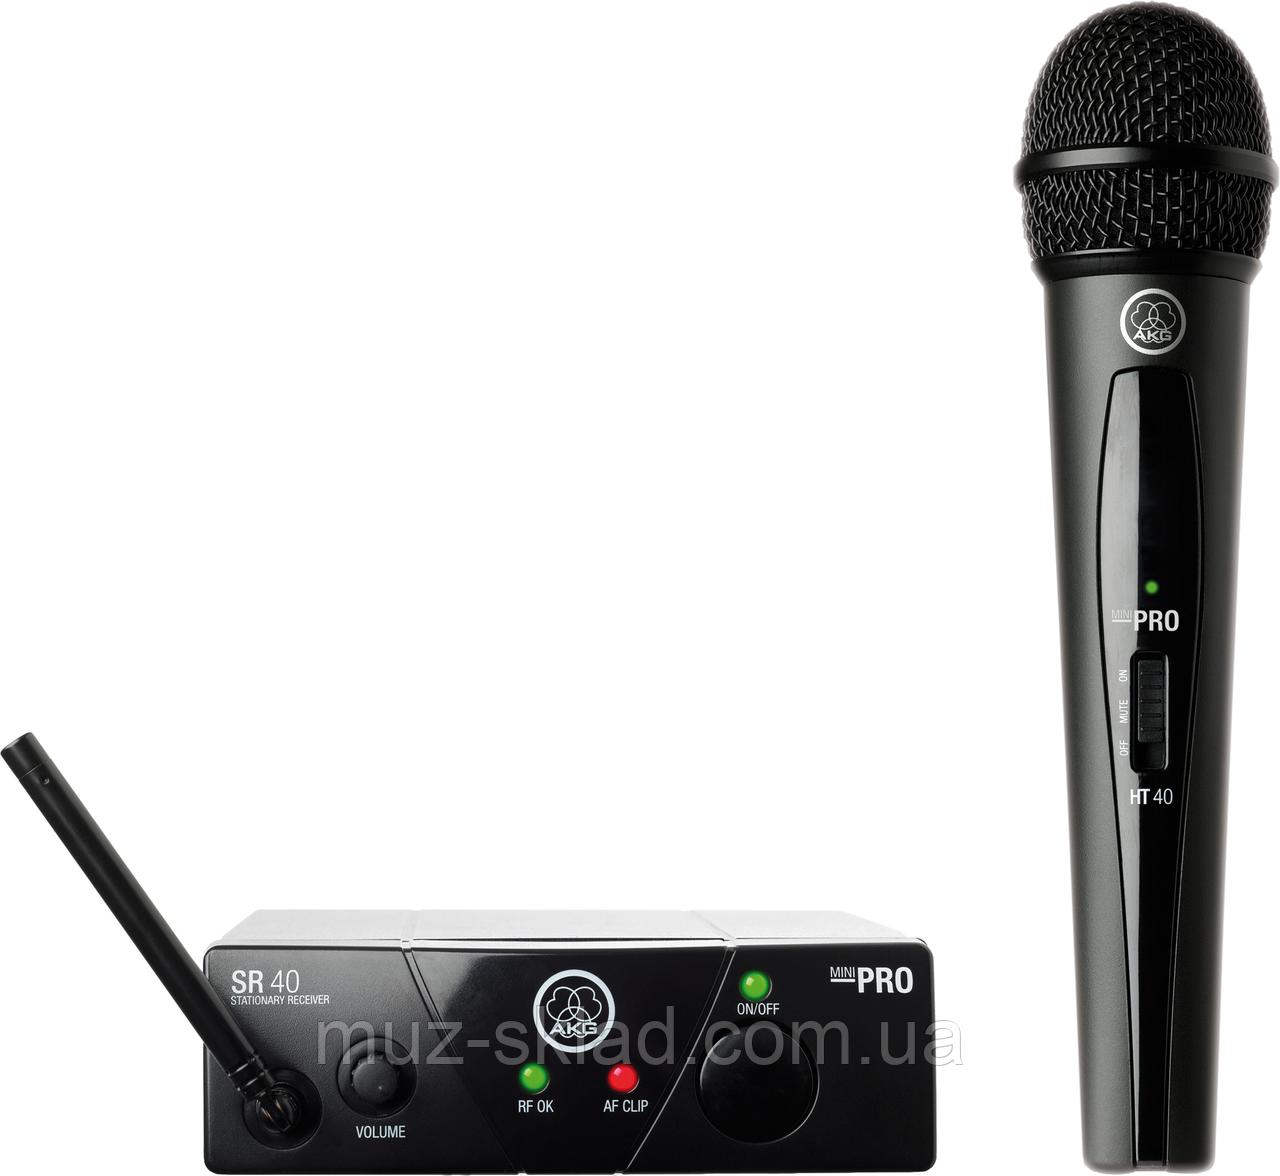 AKG WMS40 Mini Vocal Set BD US25C радиосистема UHF с ручным микрофоном